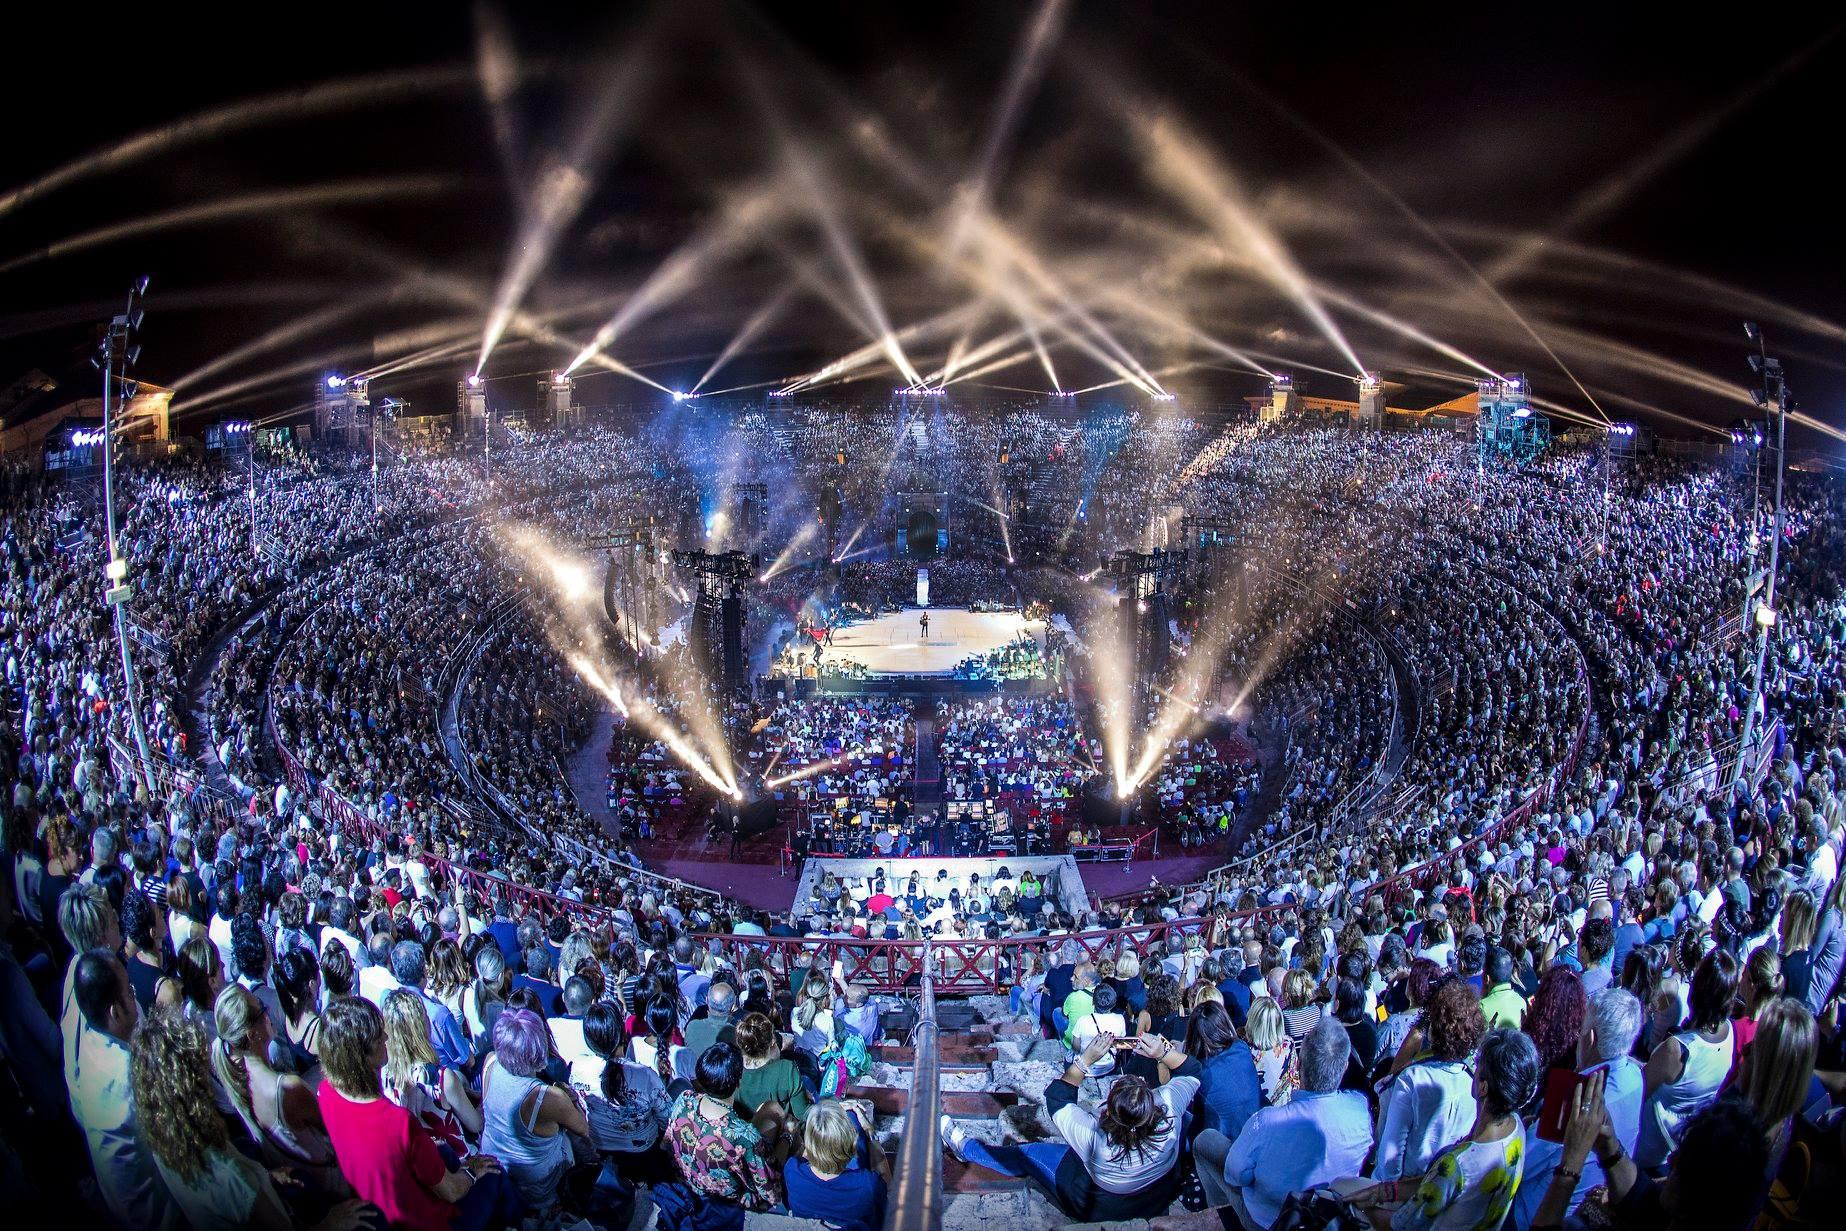 claudio baglioni arena di verona italia italy 50 al centro highline trickline show funambule circus performance spectacle suisse Slackline Lyell Grunberg  (4).jpg